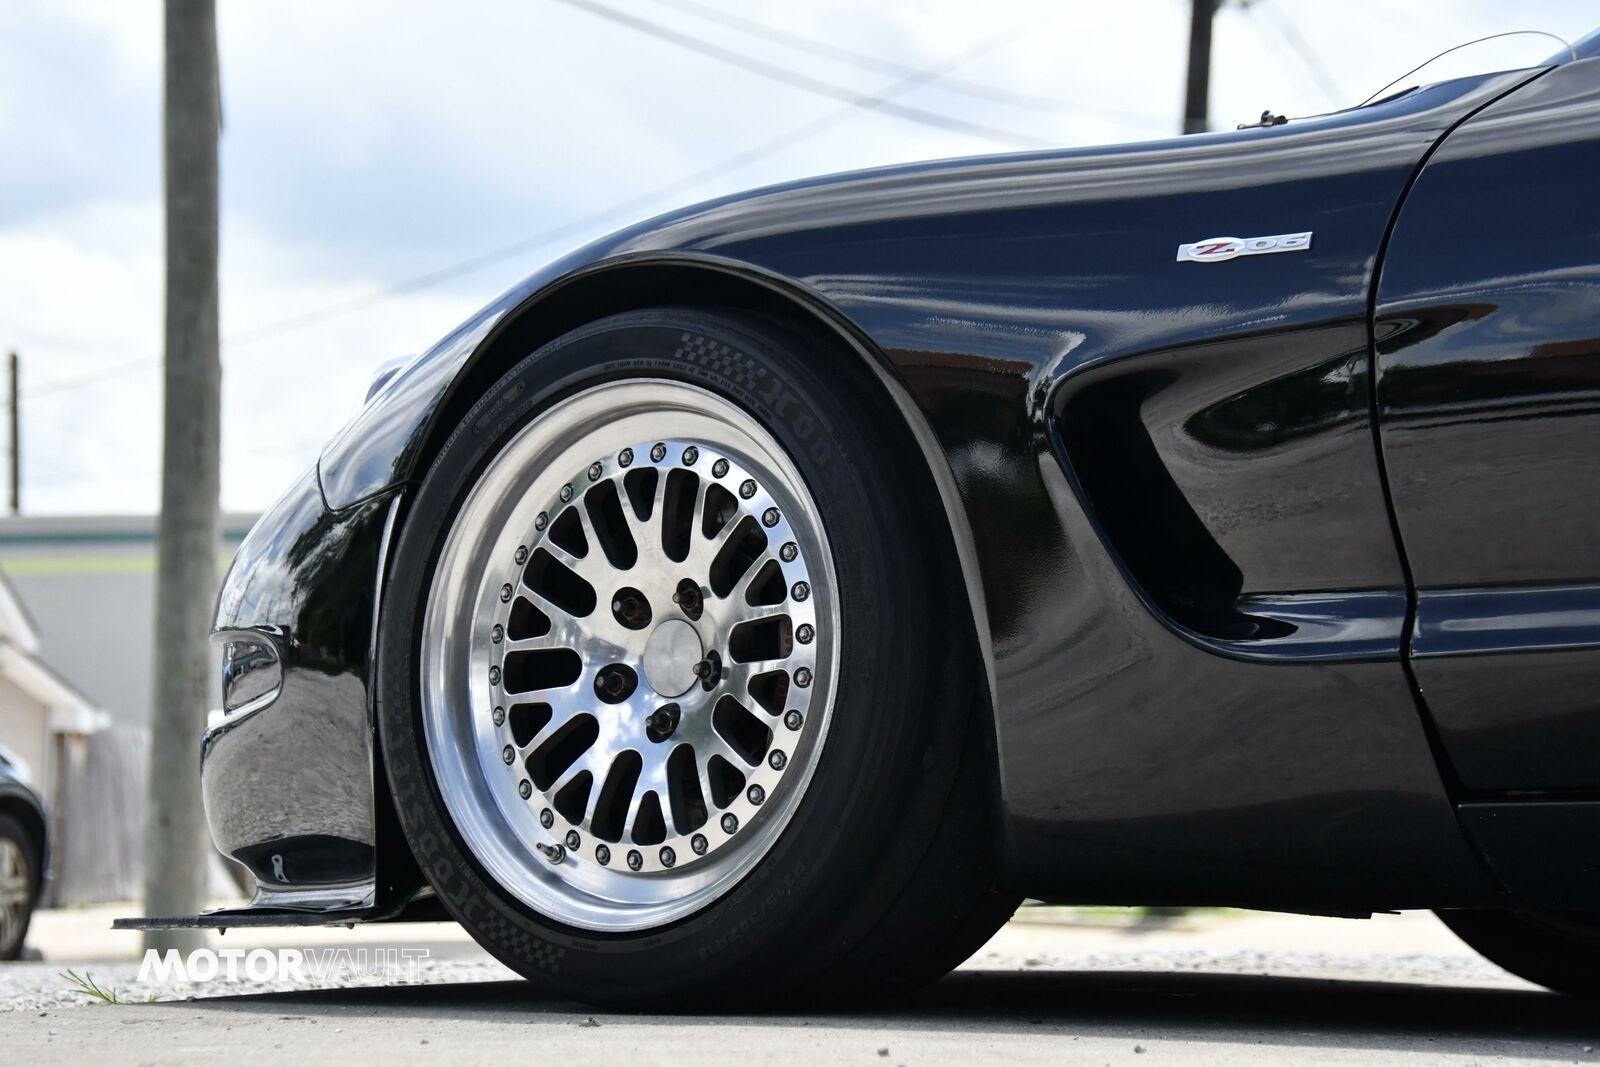 1999 Black Chevrolet Corvette   | C5 Corvette Photo 8